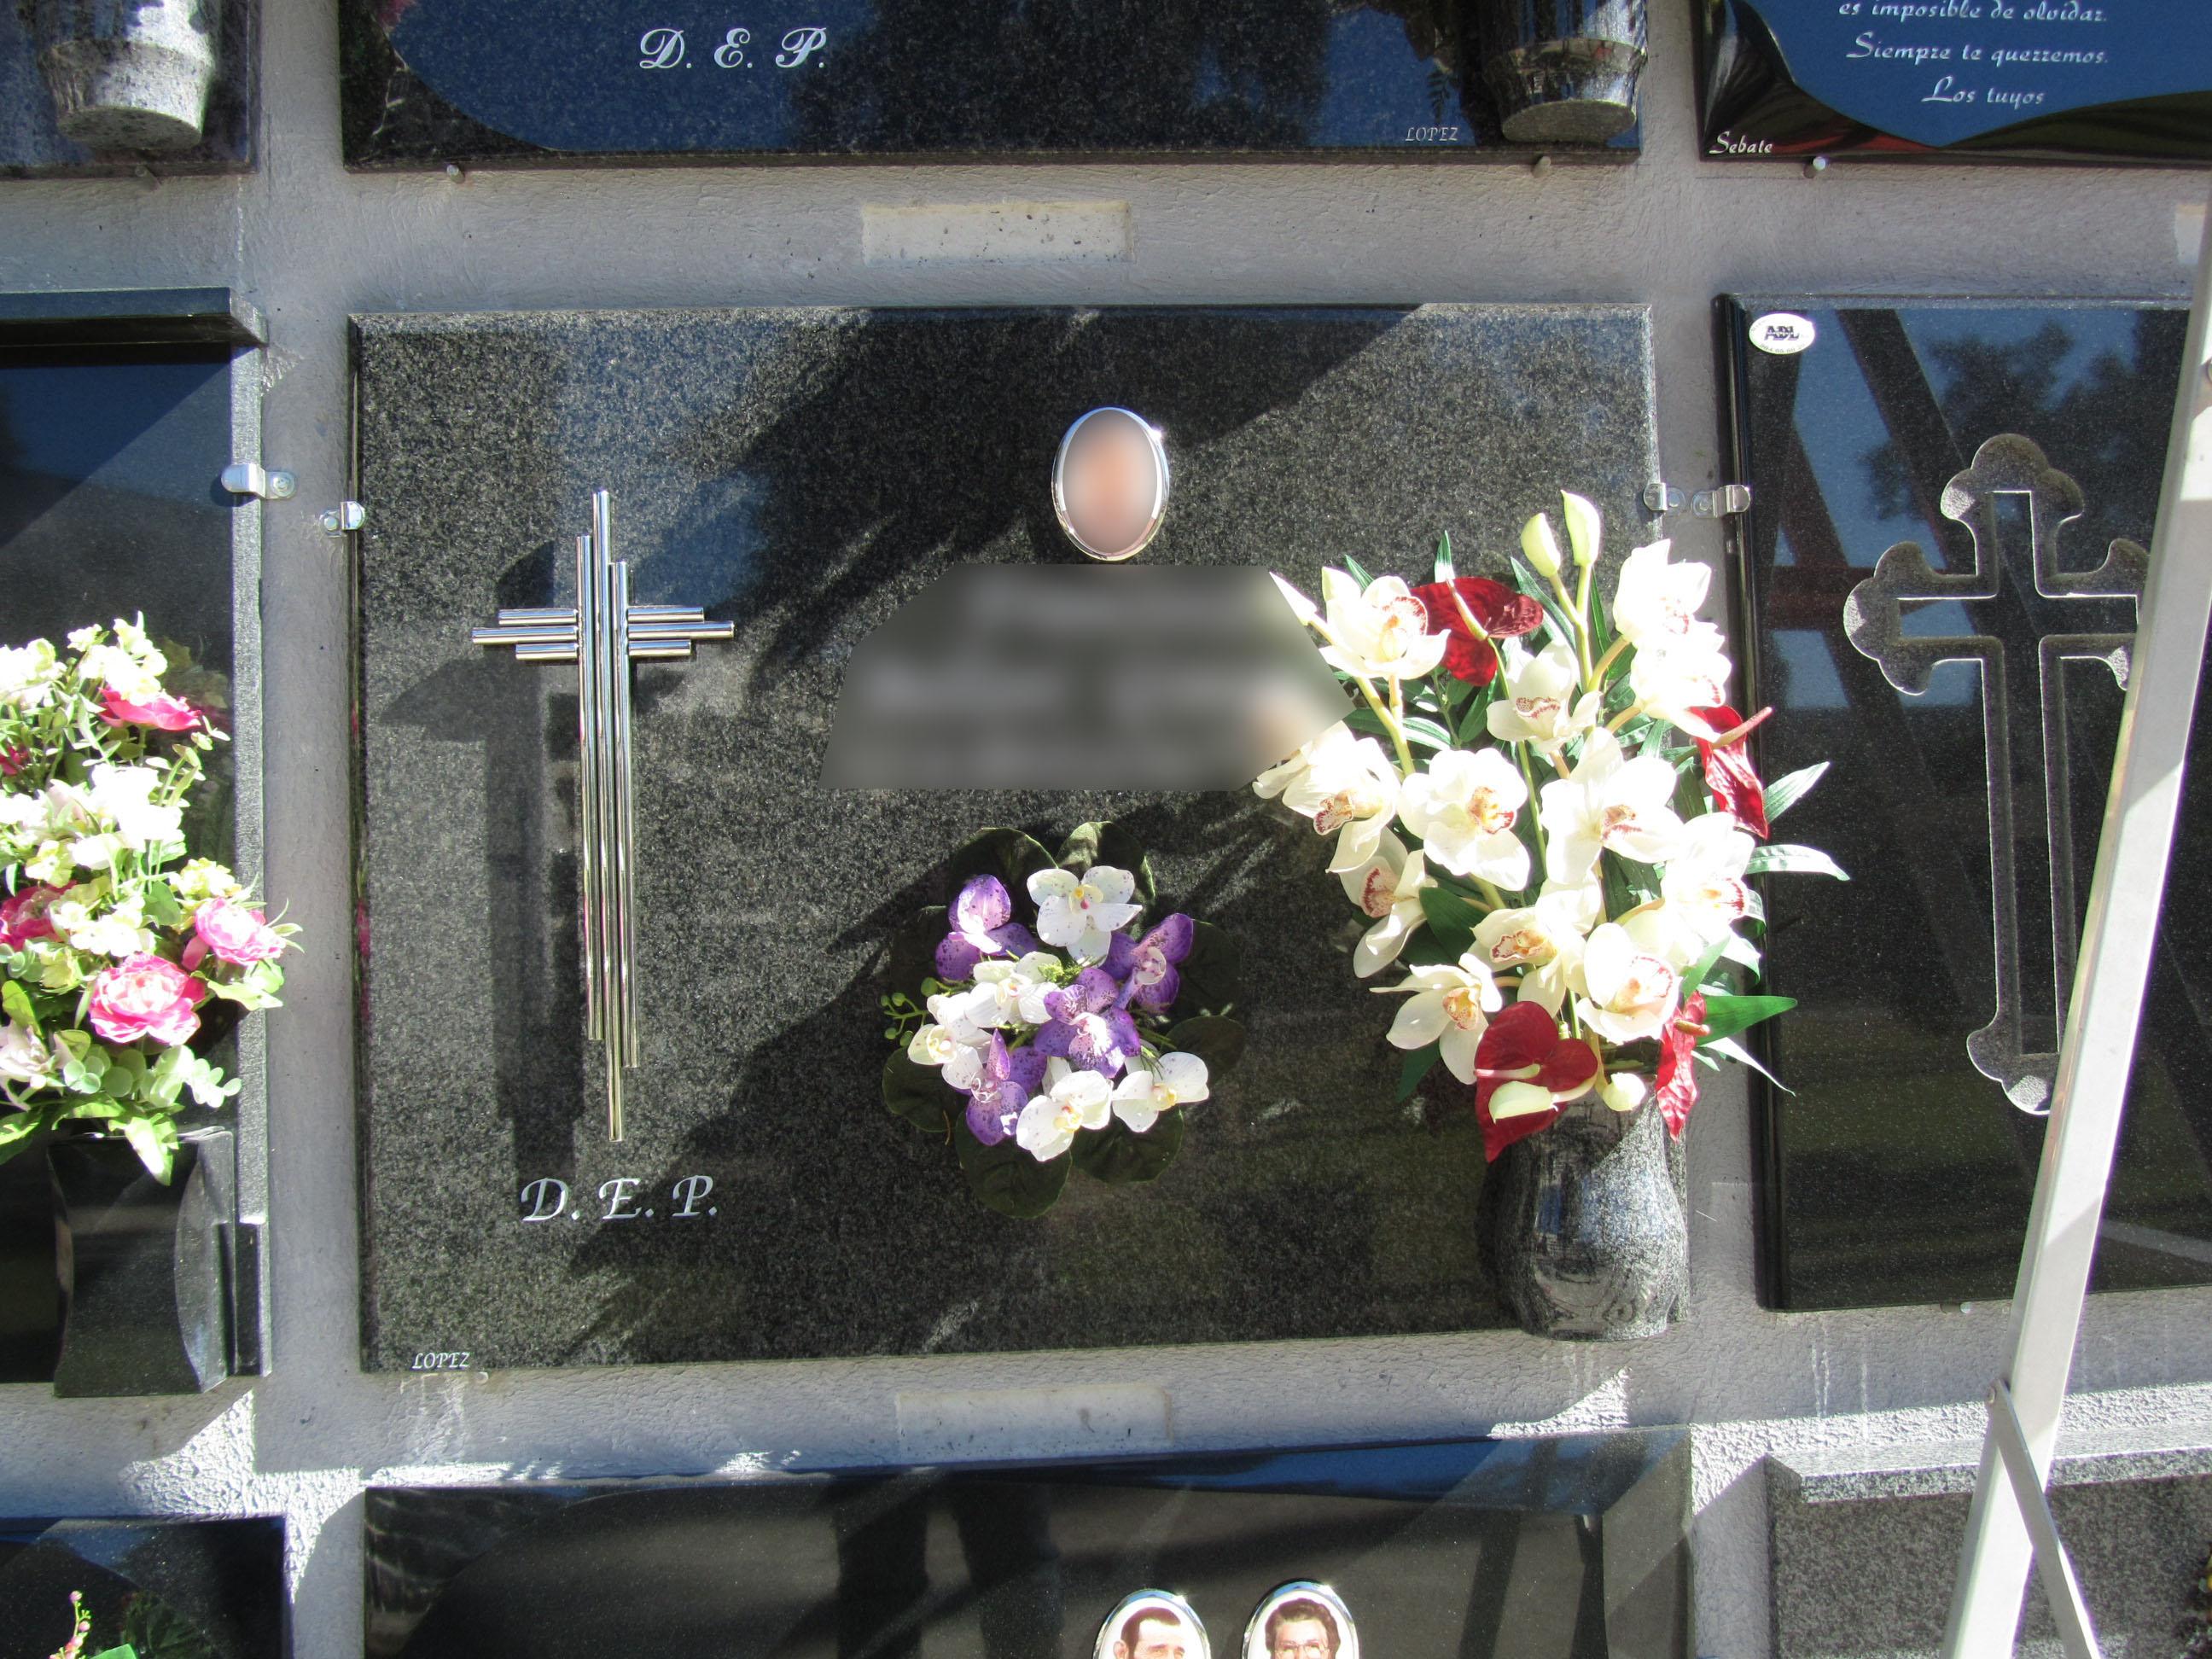 Lapida cruz acero inoxidabkle